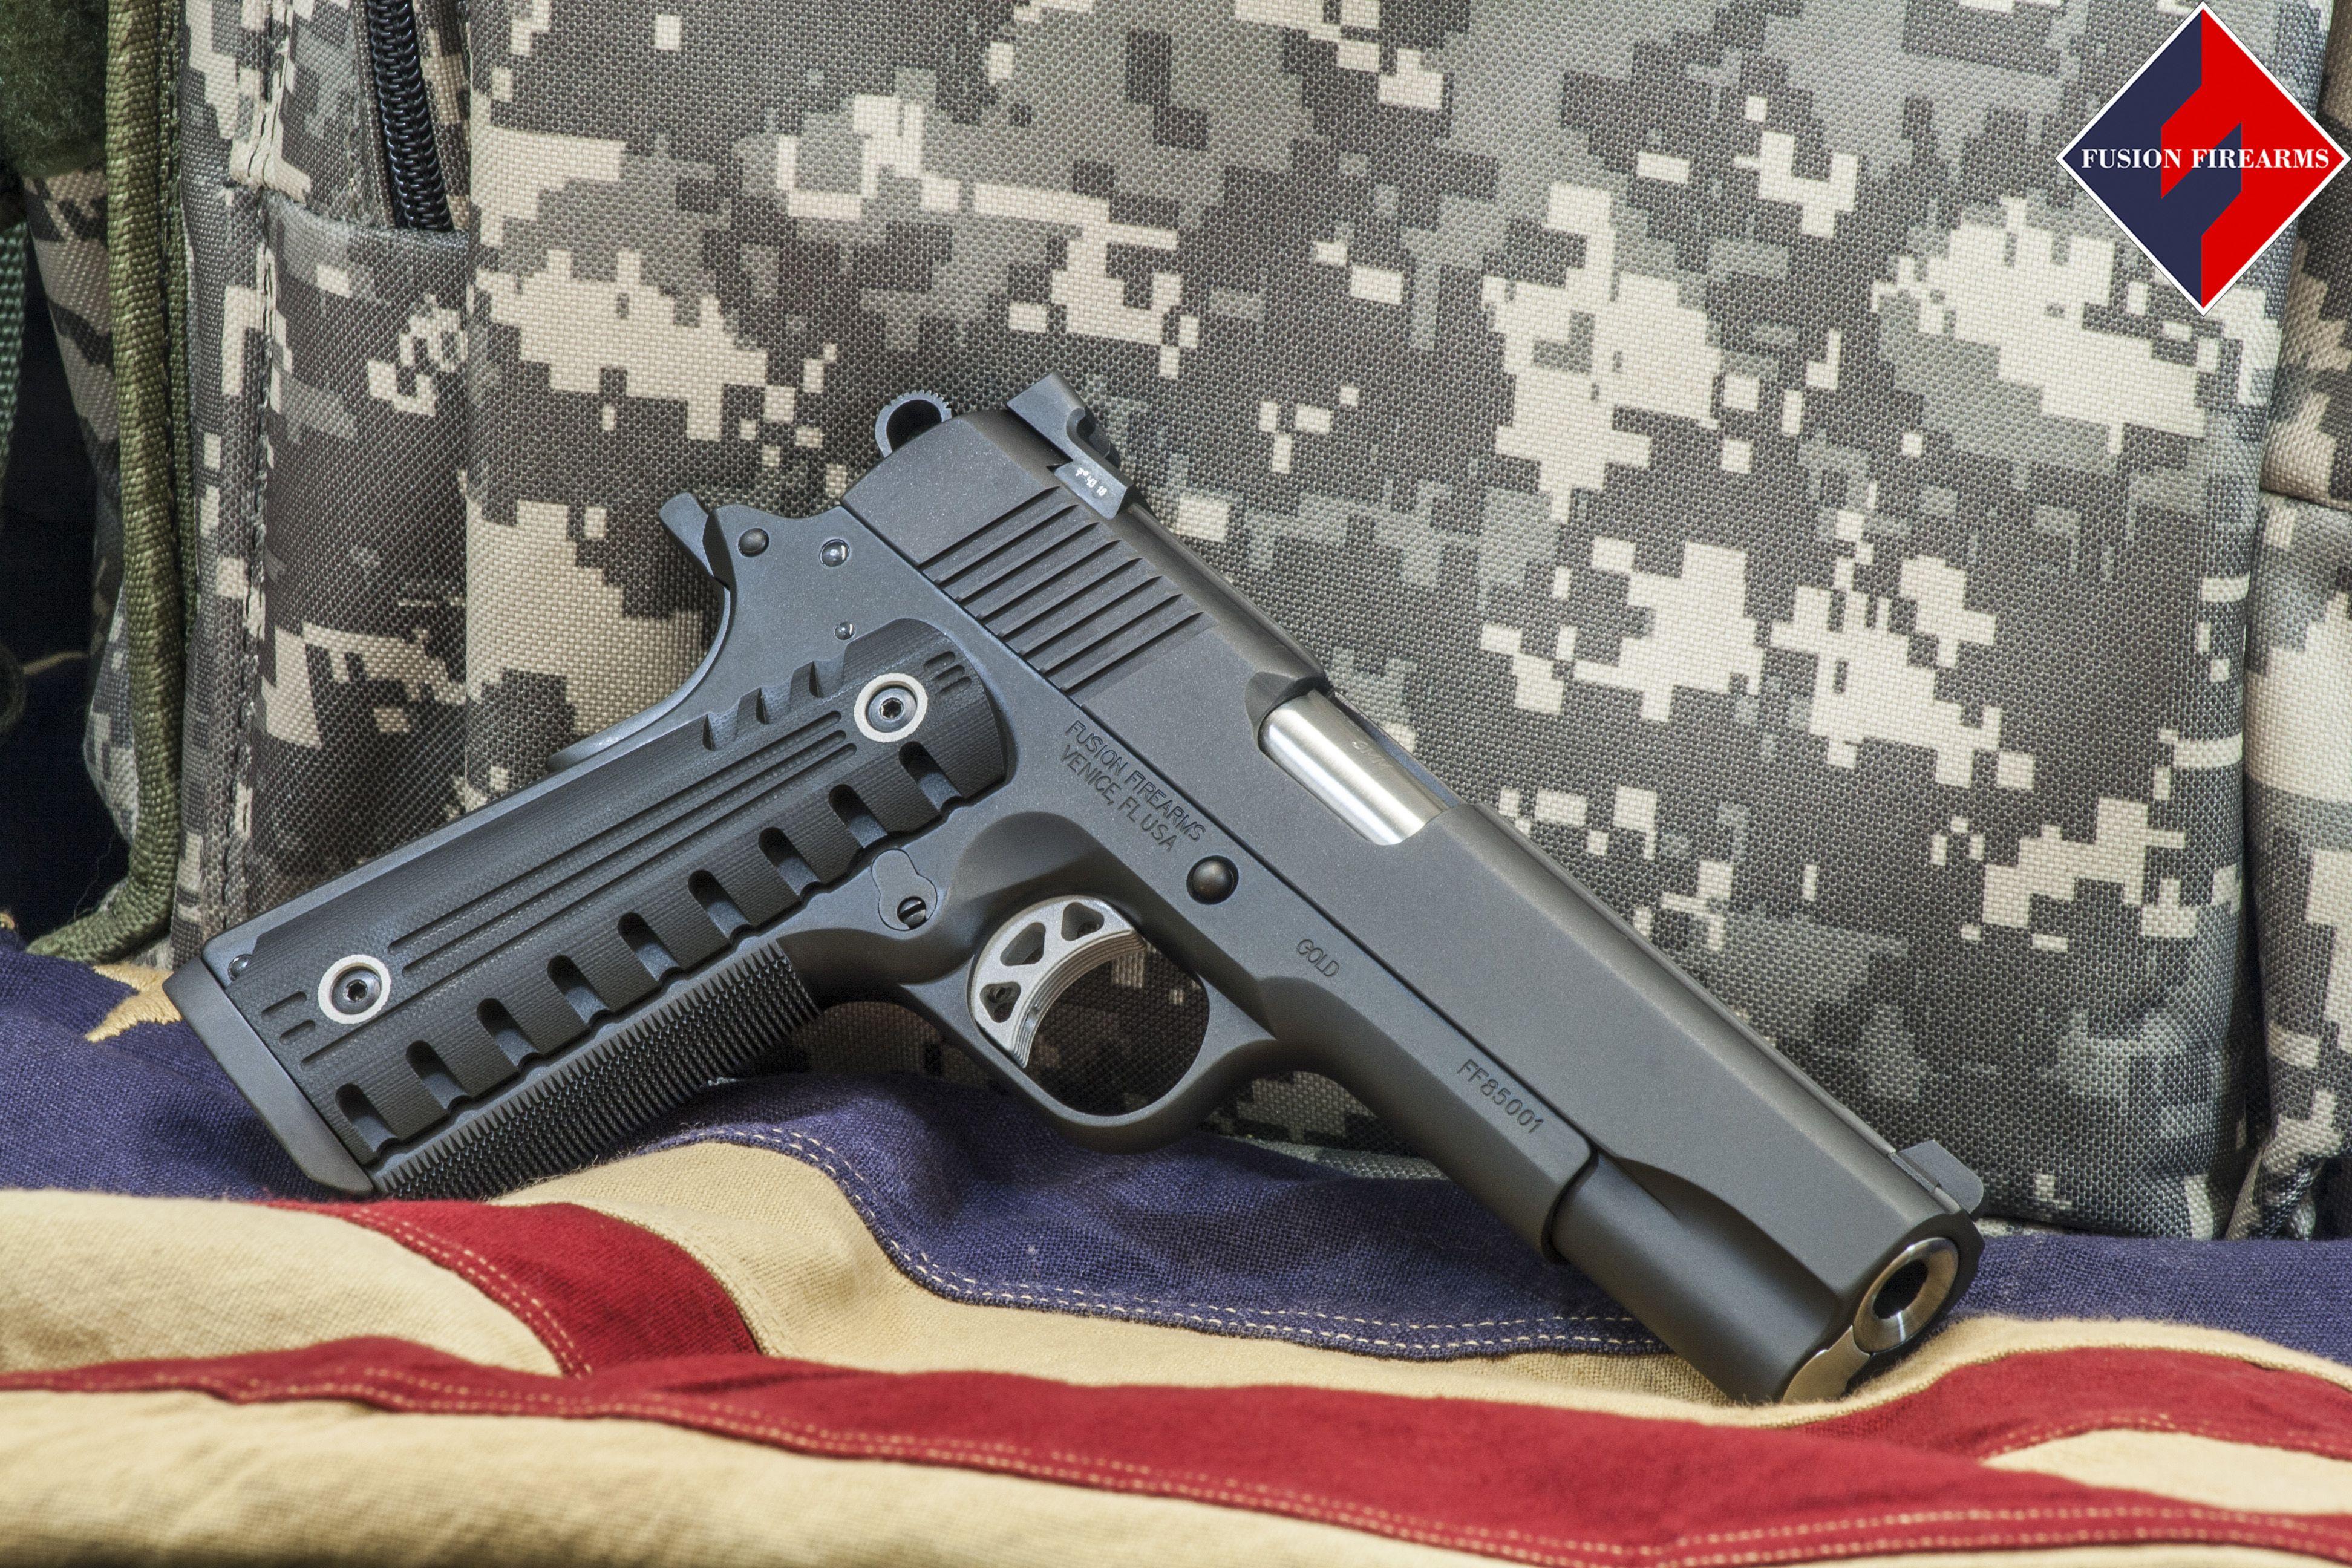 Customized Fusion Freedom Series Gold 1911 Pistol Firearms 1911 Pistol Guns